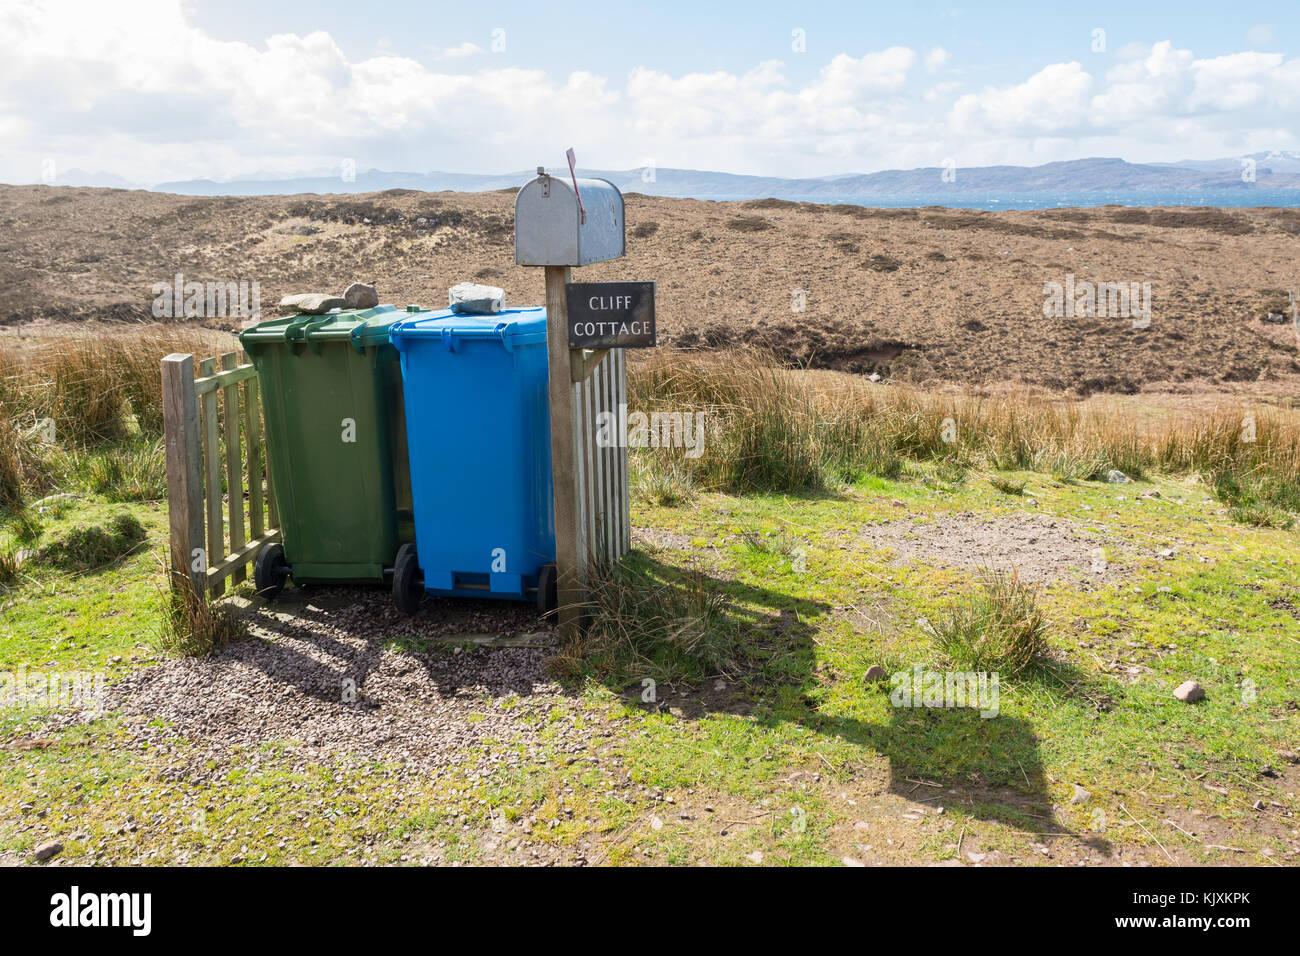 wheelie bins in a remote Scottish location - Stock Image